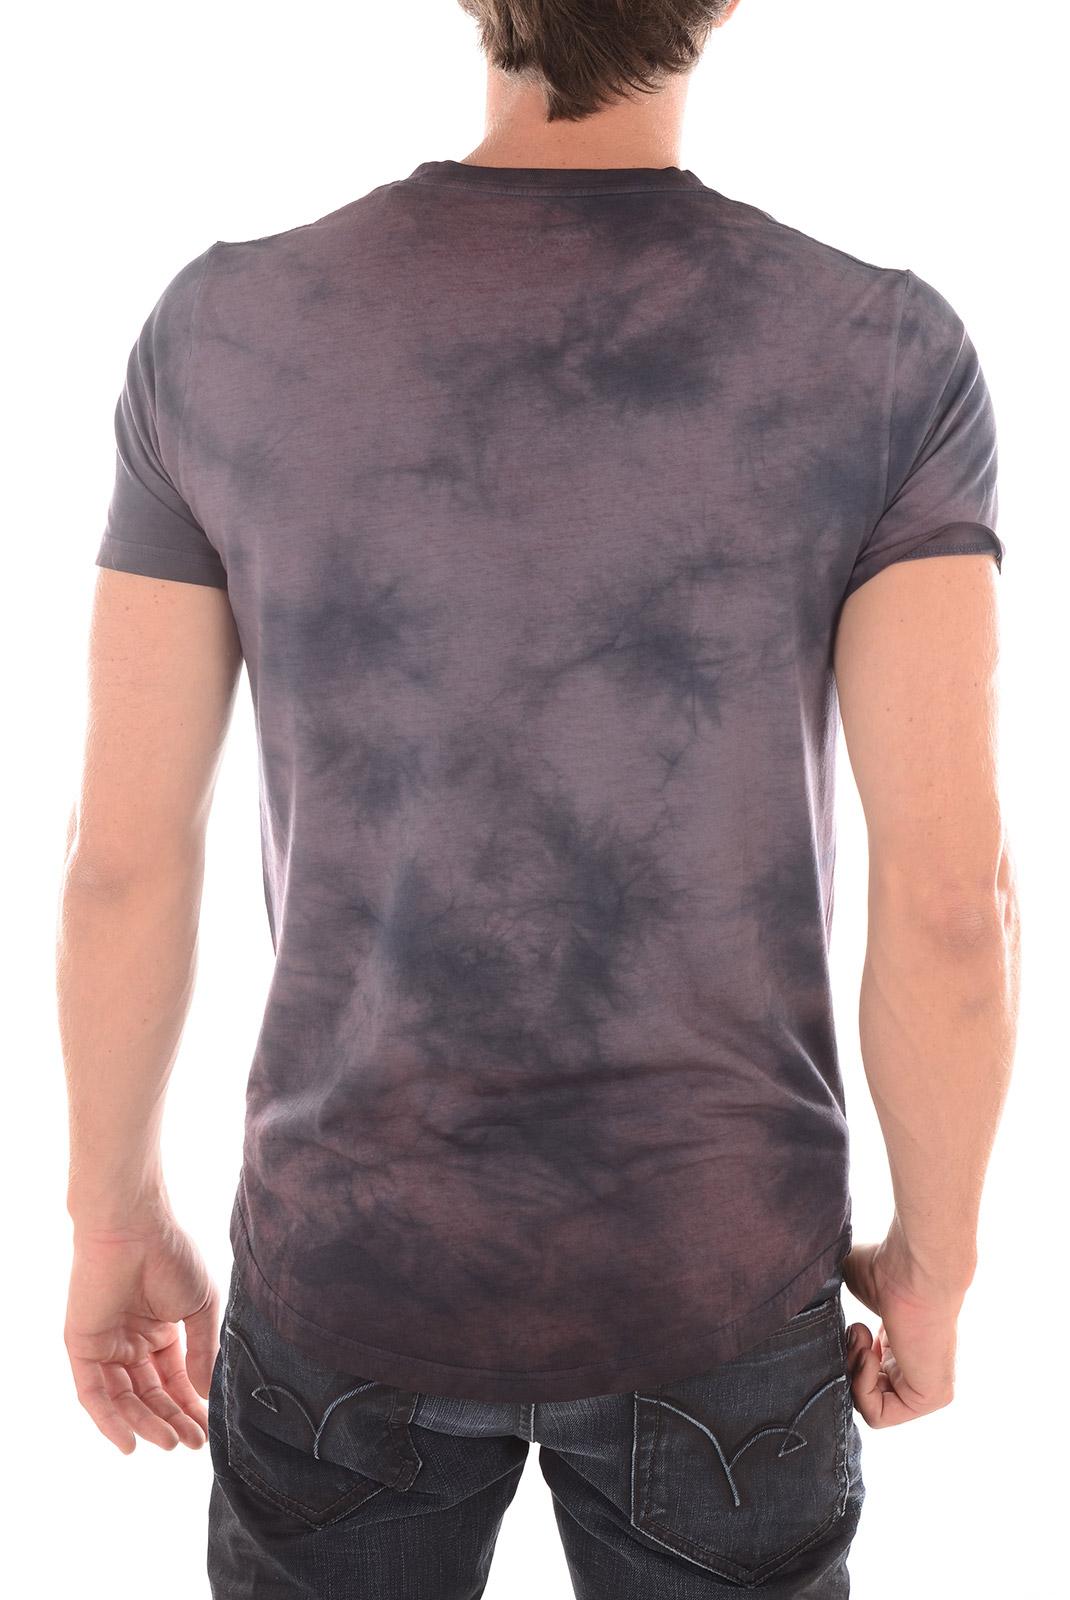 Tee-shirts  Pepe jeans PM502554 AIKEN 582 MIDNIGHT